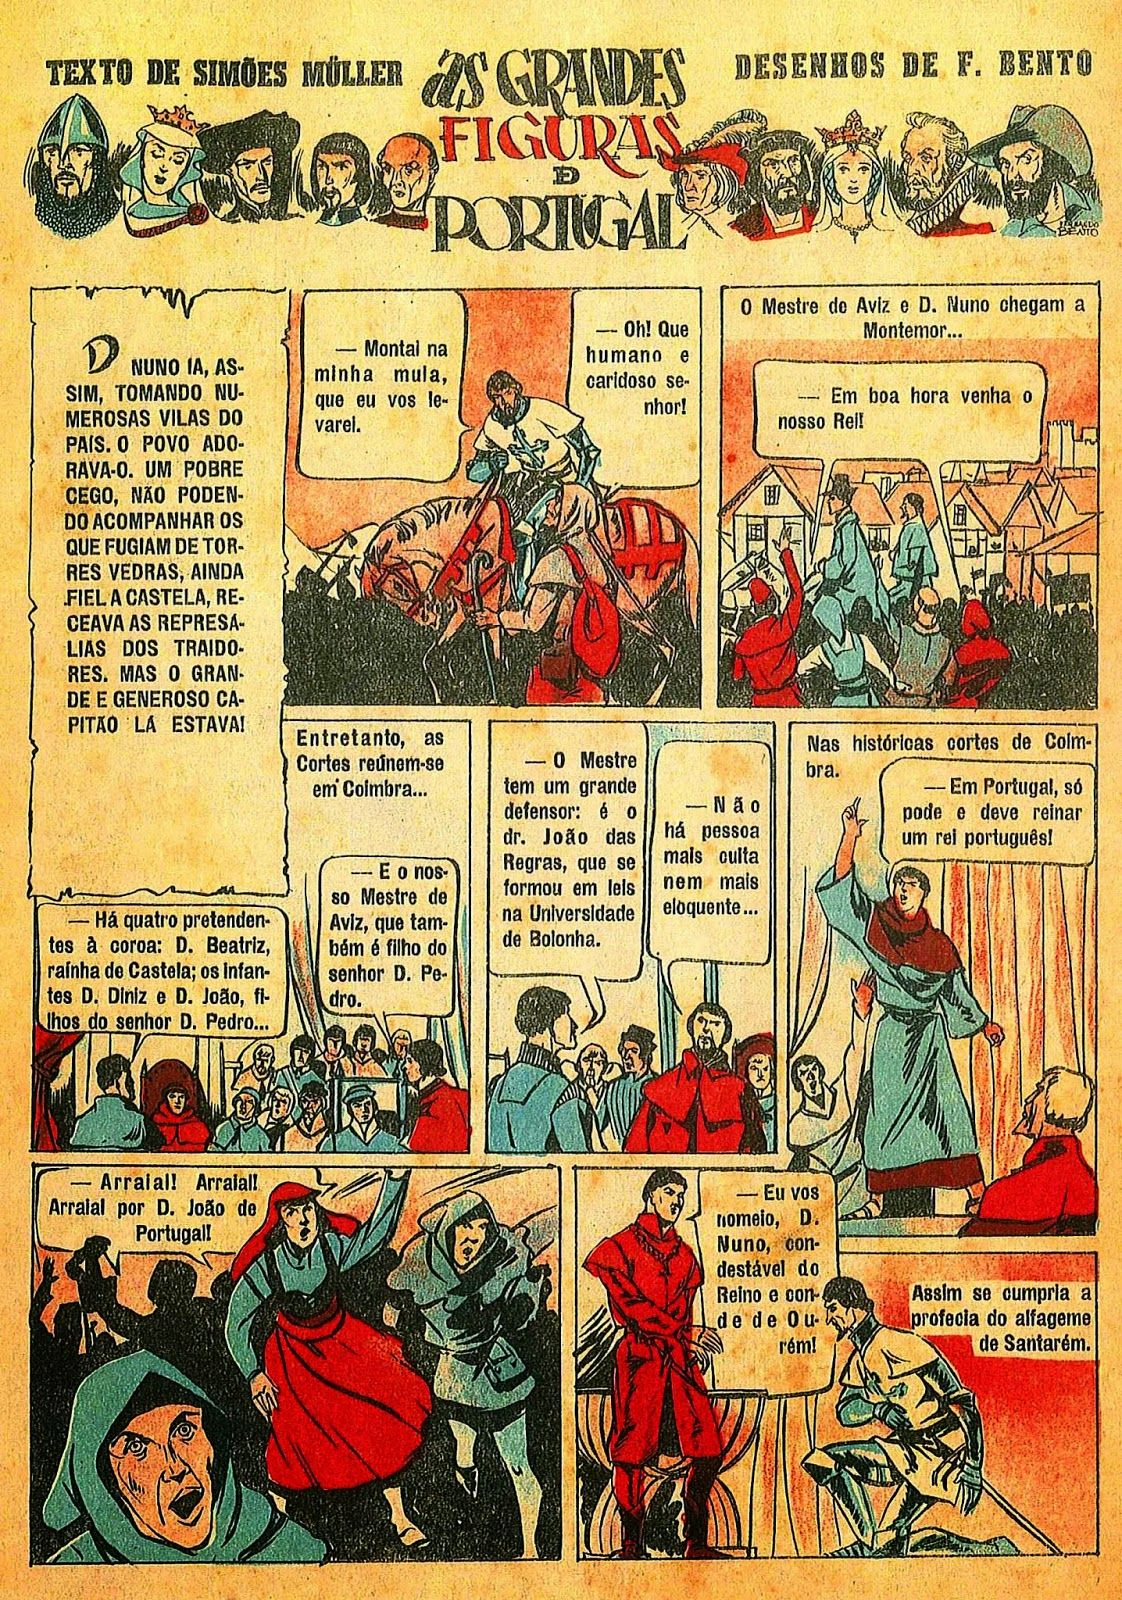 BDBD - Blogue De Banda Desenhada: BD E HISTÓRIA DE PORTUGAL (6) - NUNO ÁLVARES…